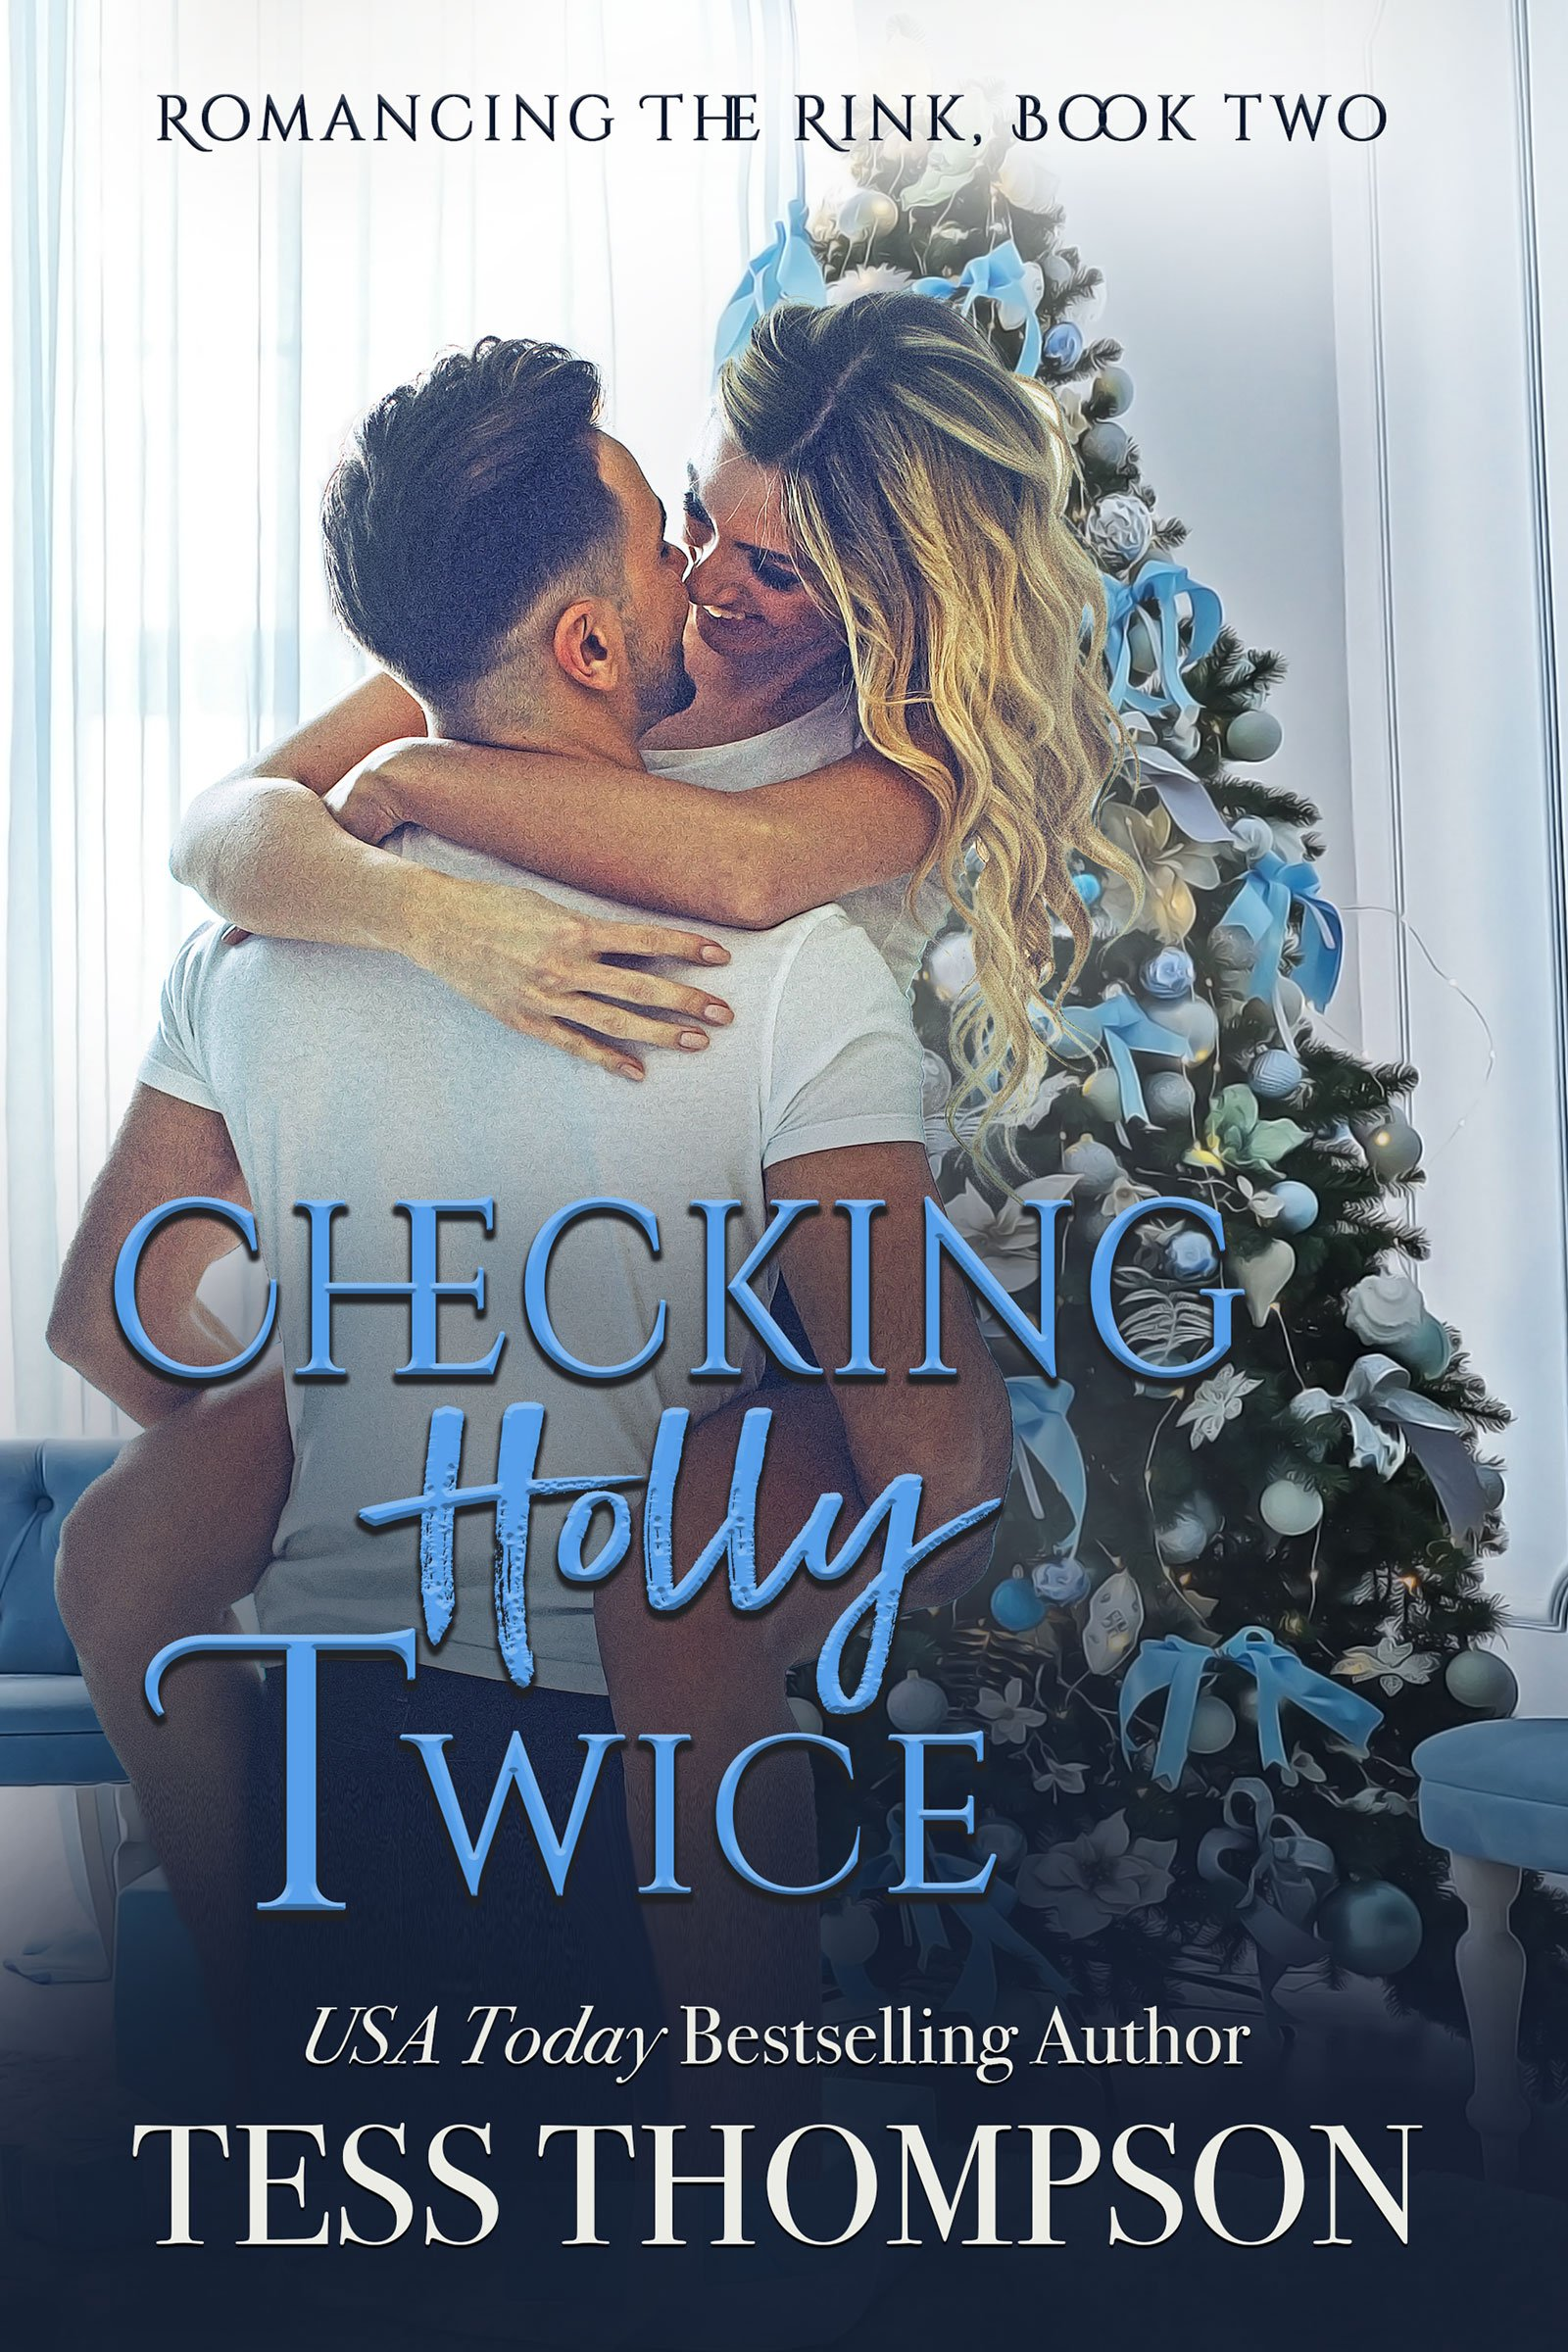 Checking-Holly-Twice-e-reader